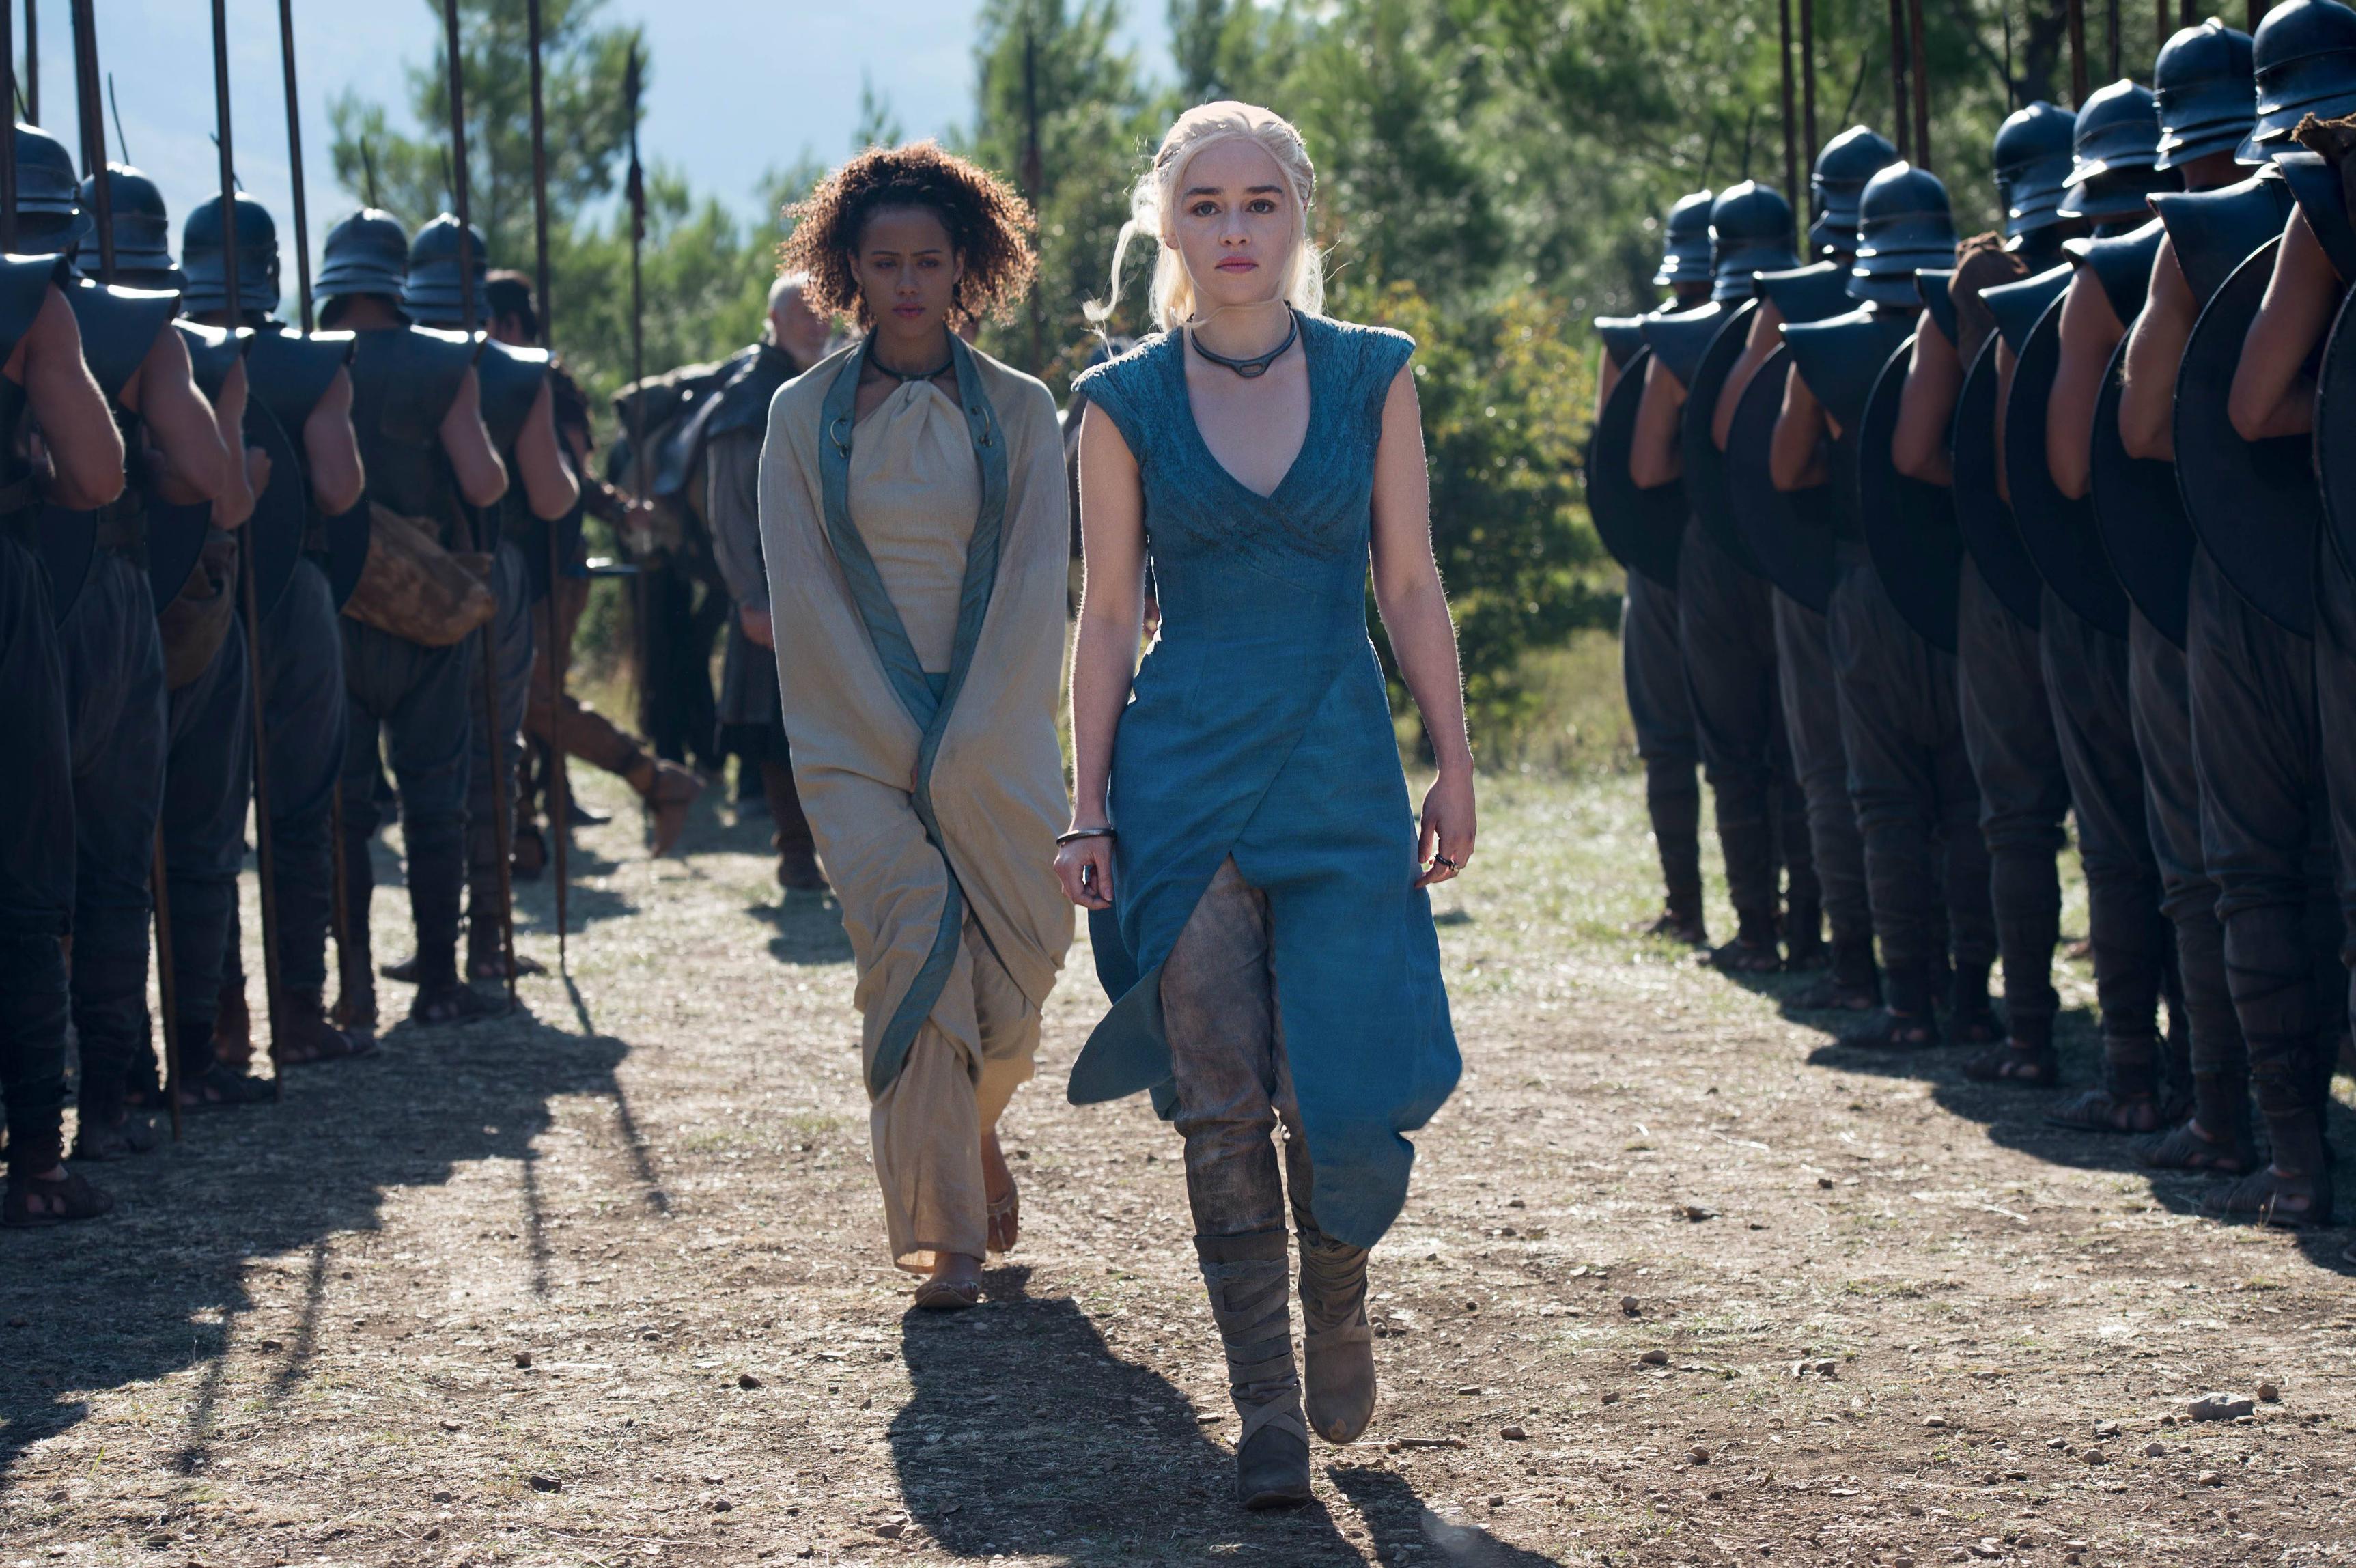 Missandei and Daenerys Targaryen